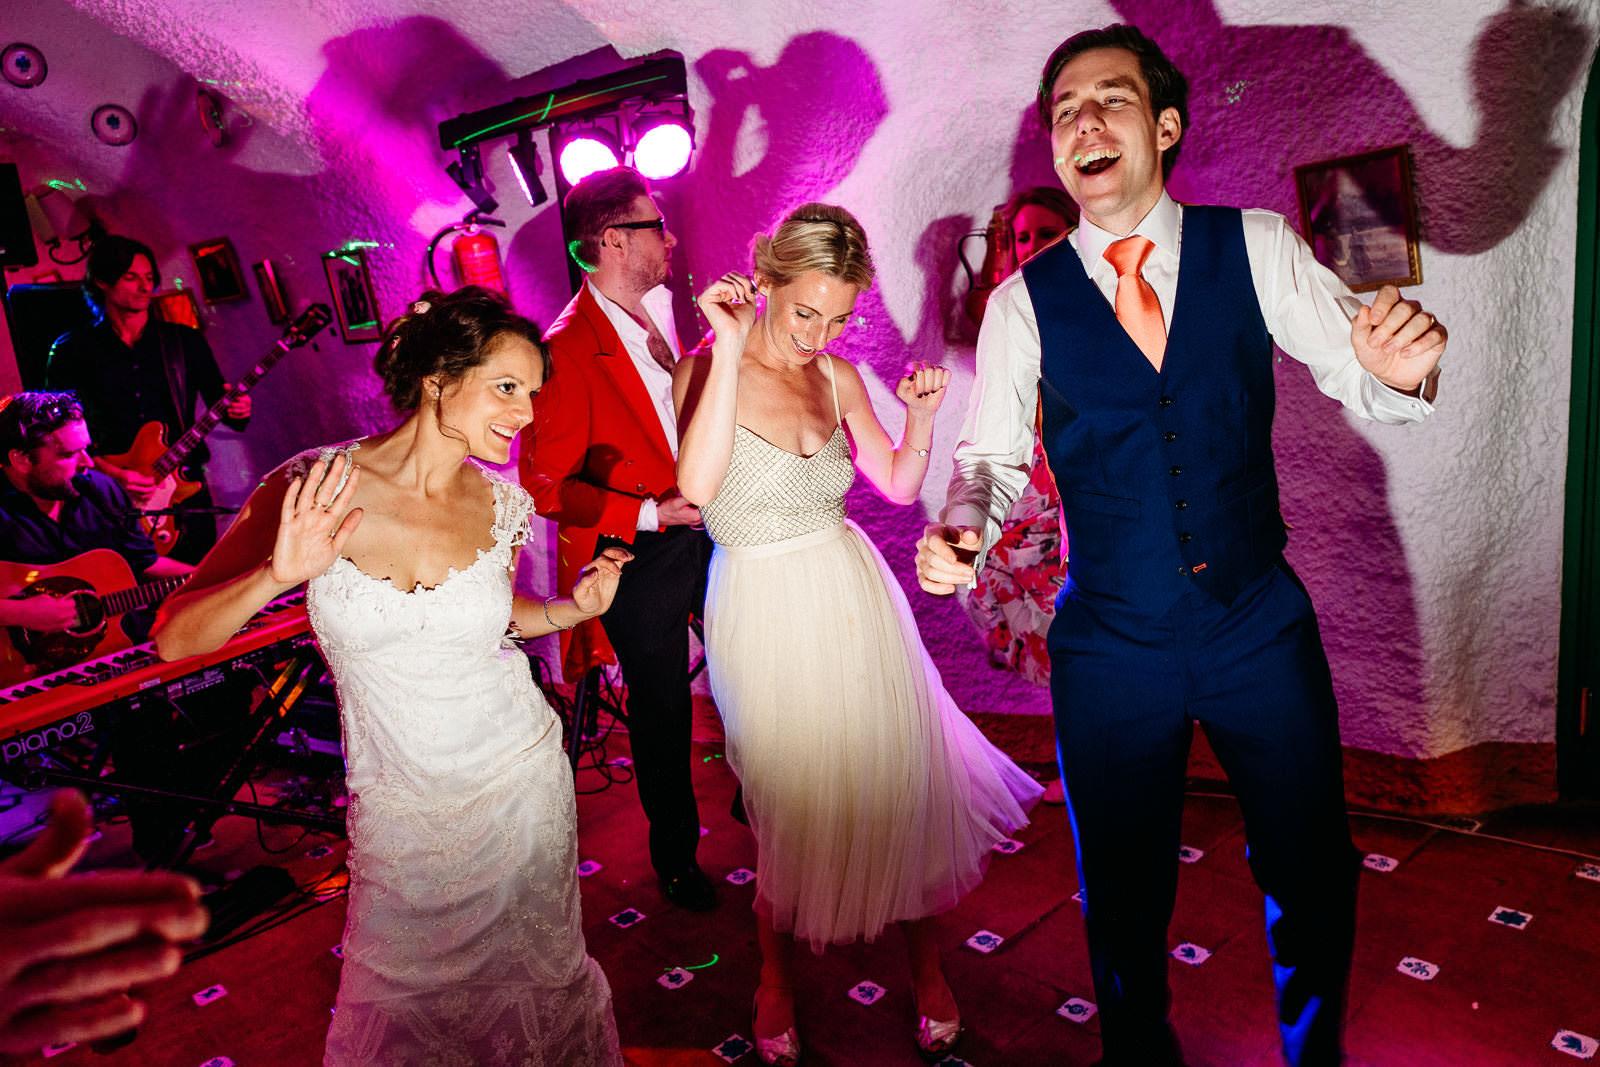 granada_destination_wedding_spain_073